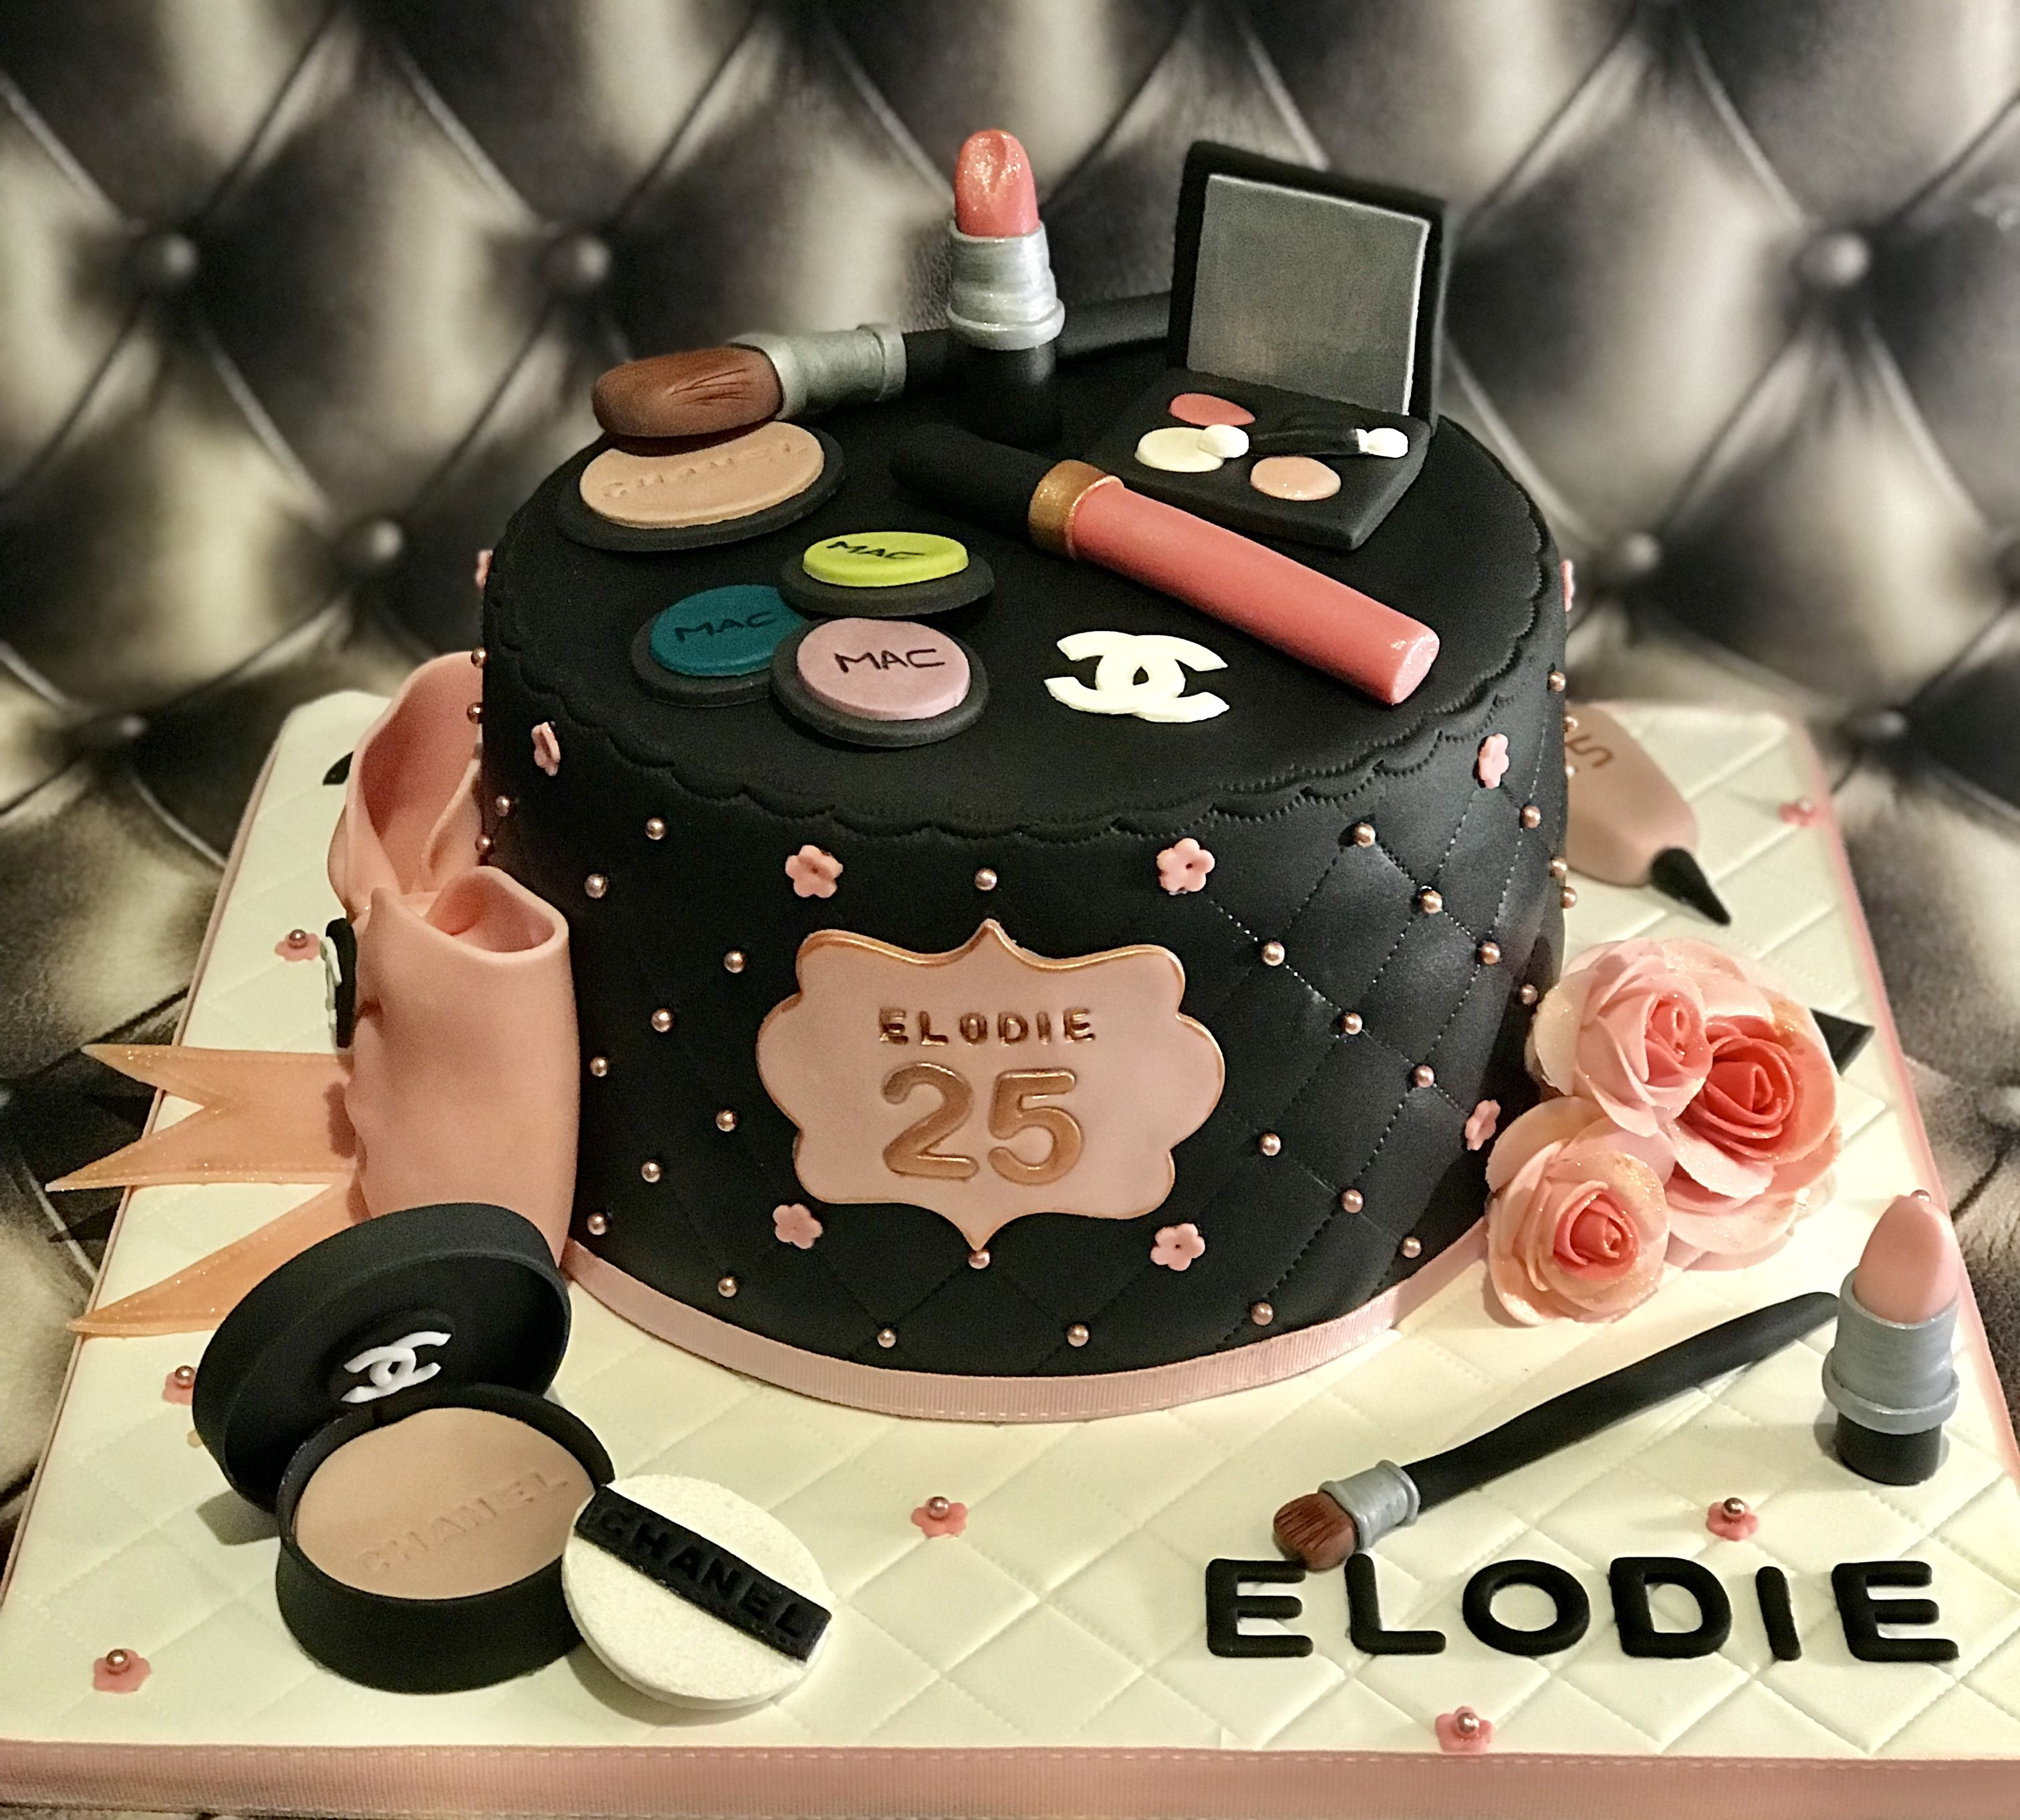 makeup box cake design 1 ans autour du maquillage  Artist cake, Cake, Desserts